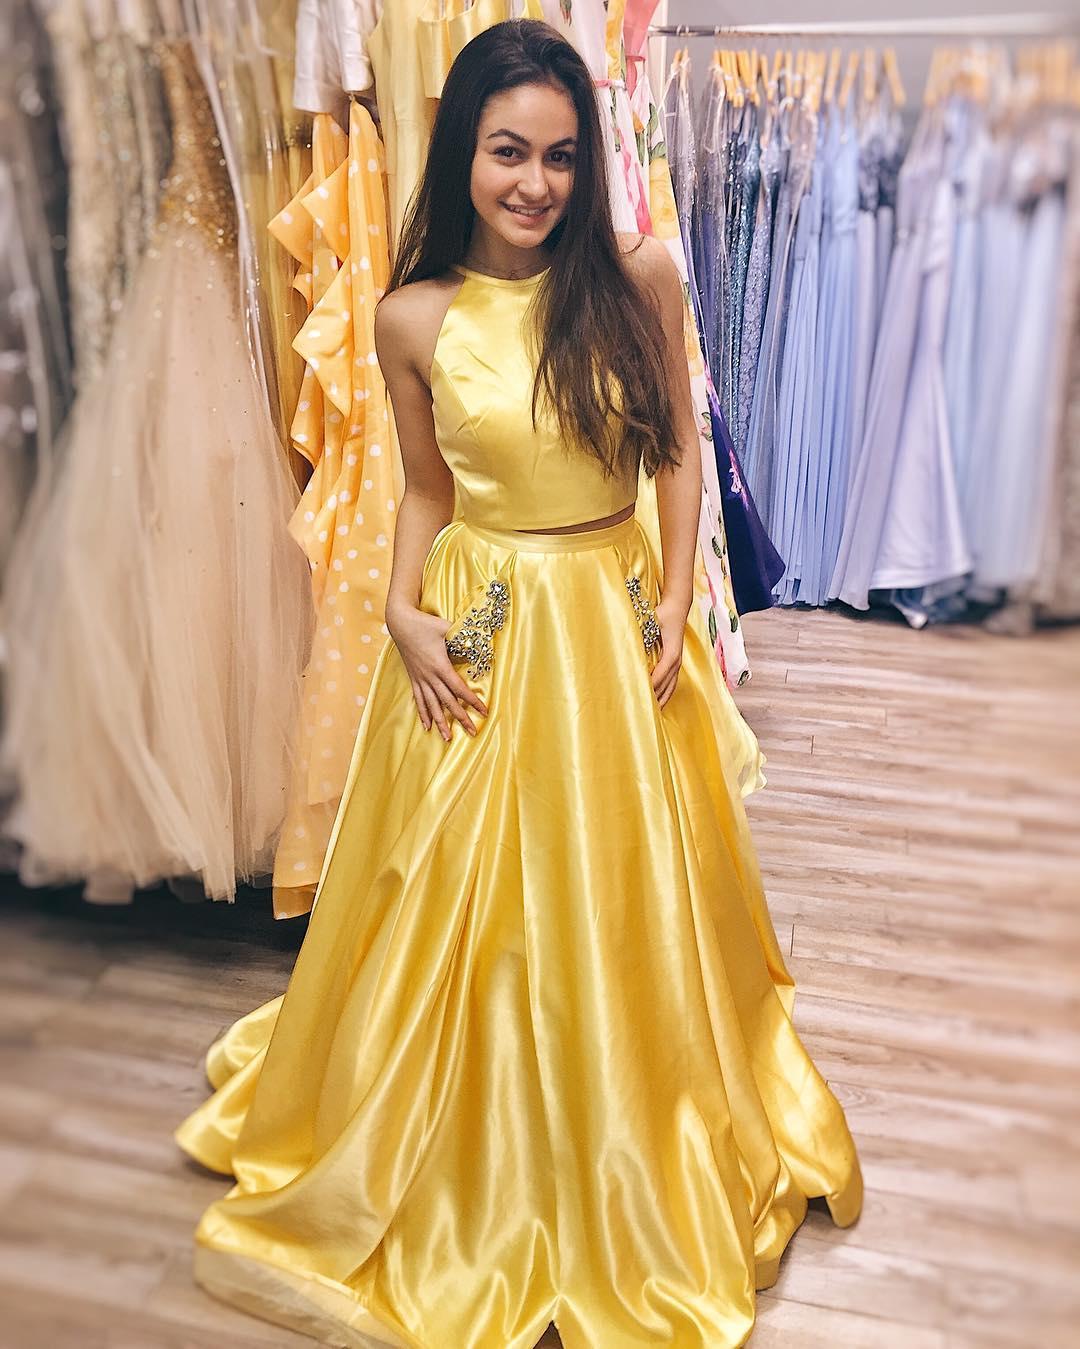 Yellow Dress Everything Everything